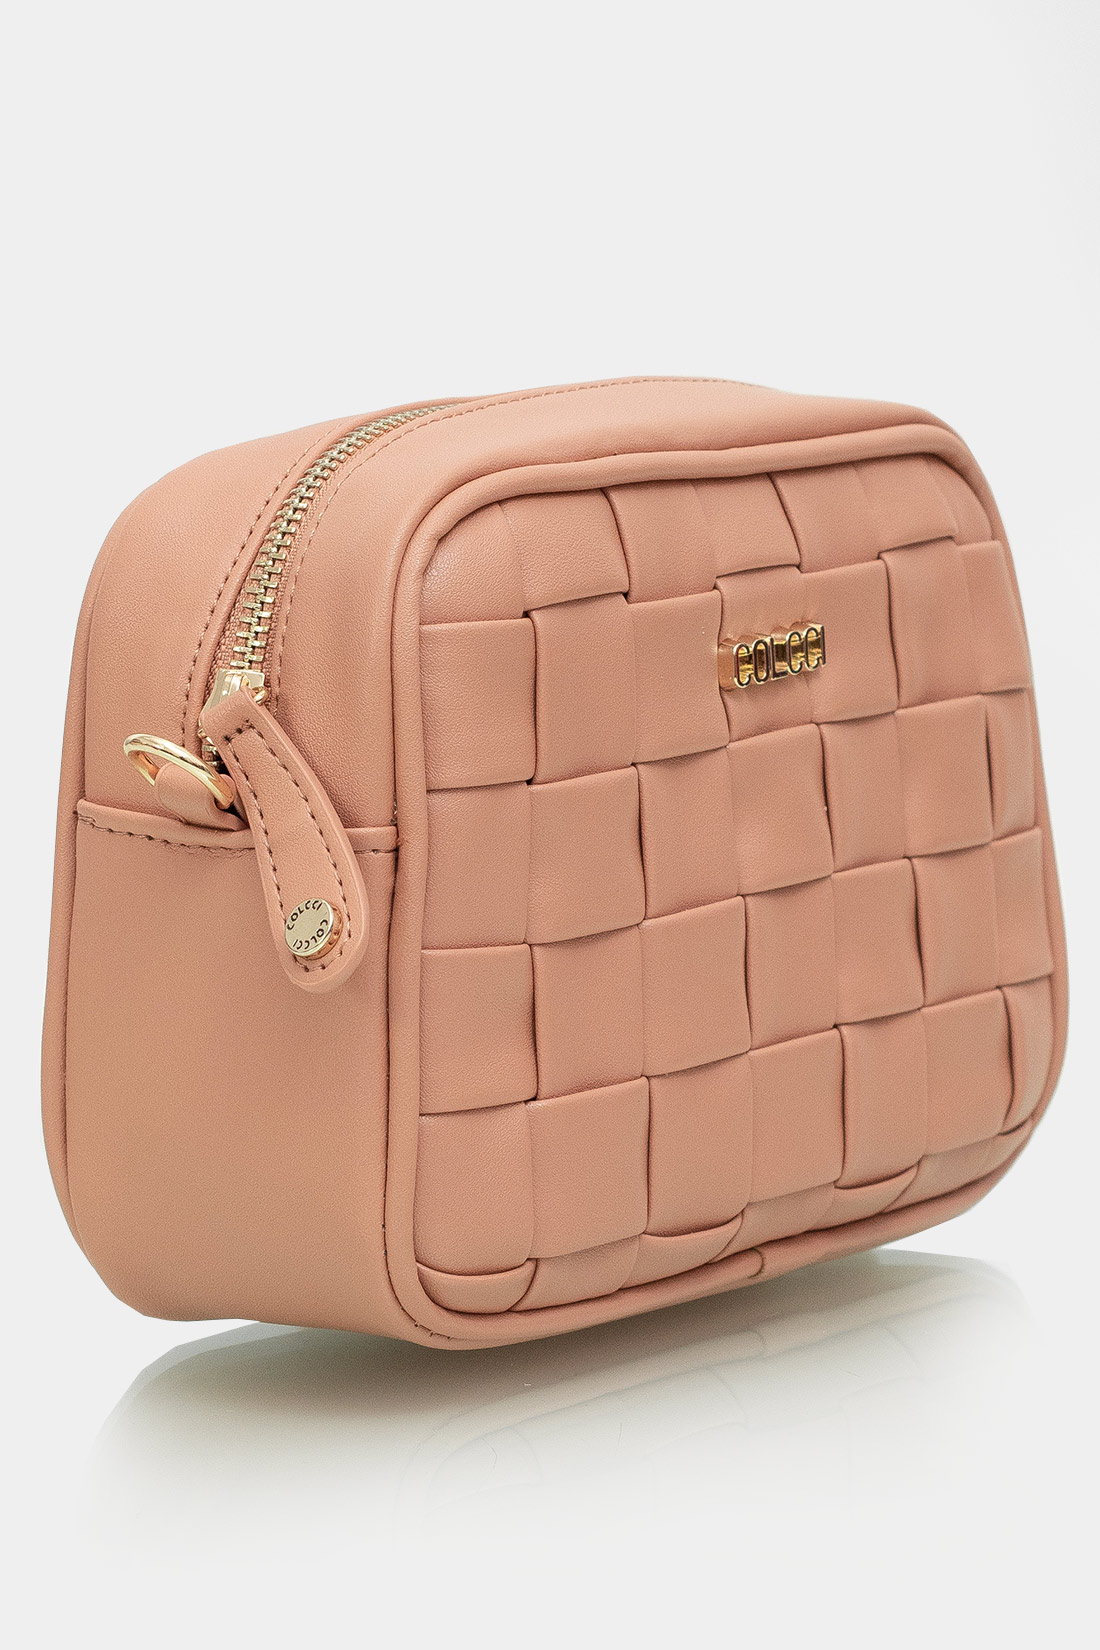 Bolsa Colcci Camera Bag Entrelacado